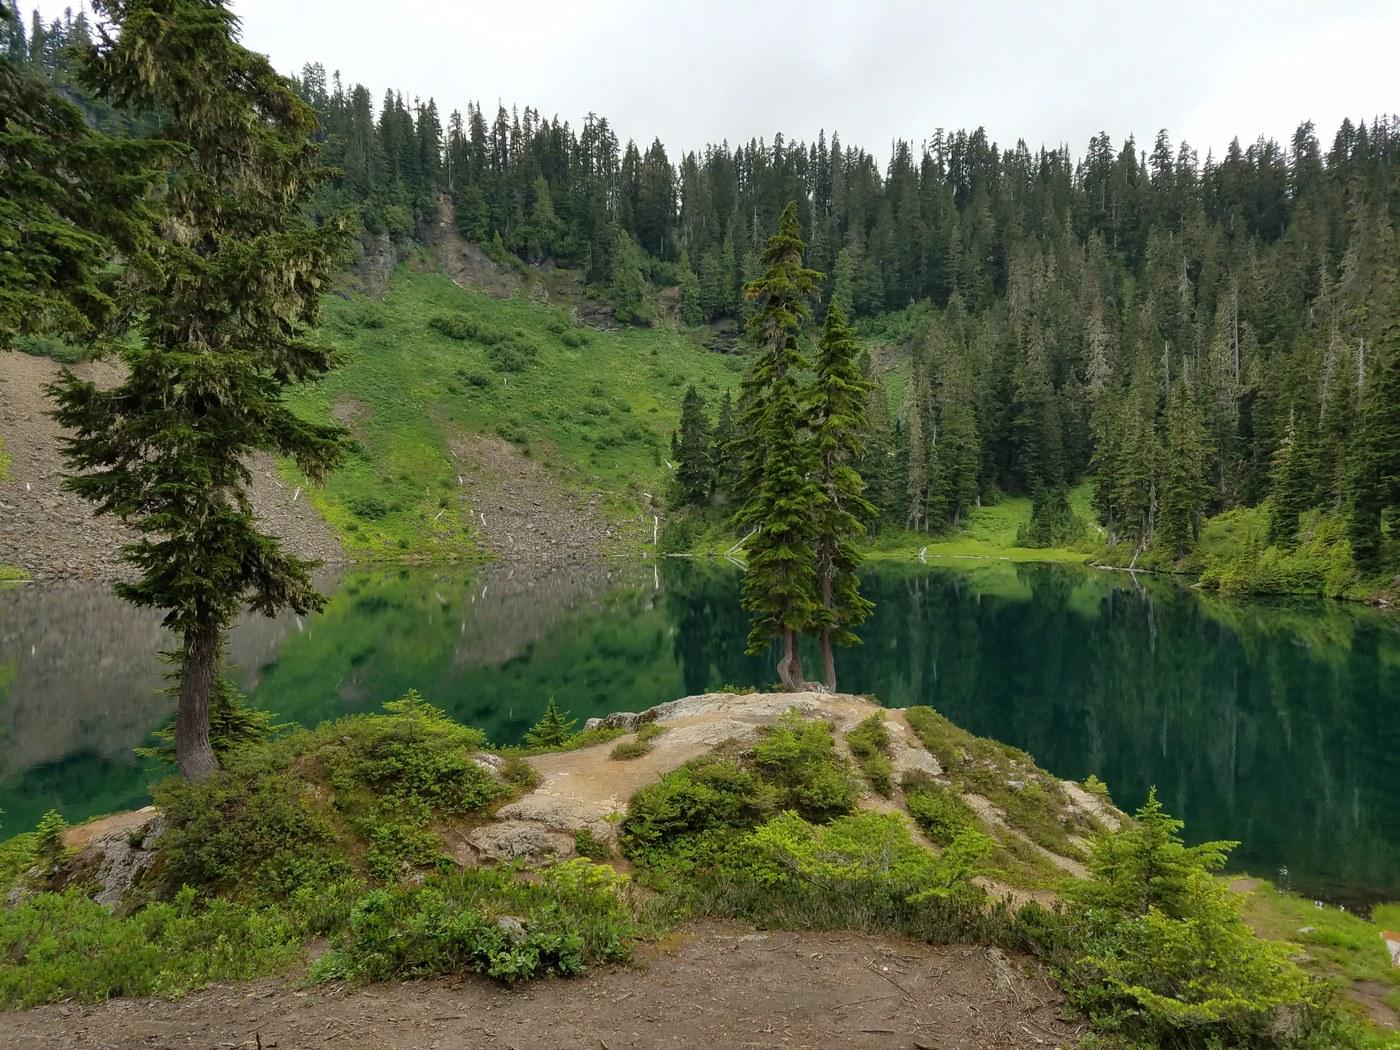 Blue Lake. Photo by Dave@Everett.jpeg